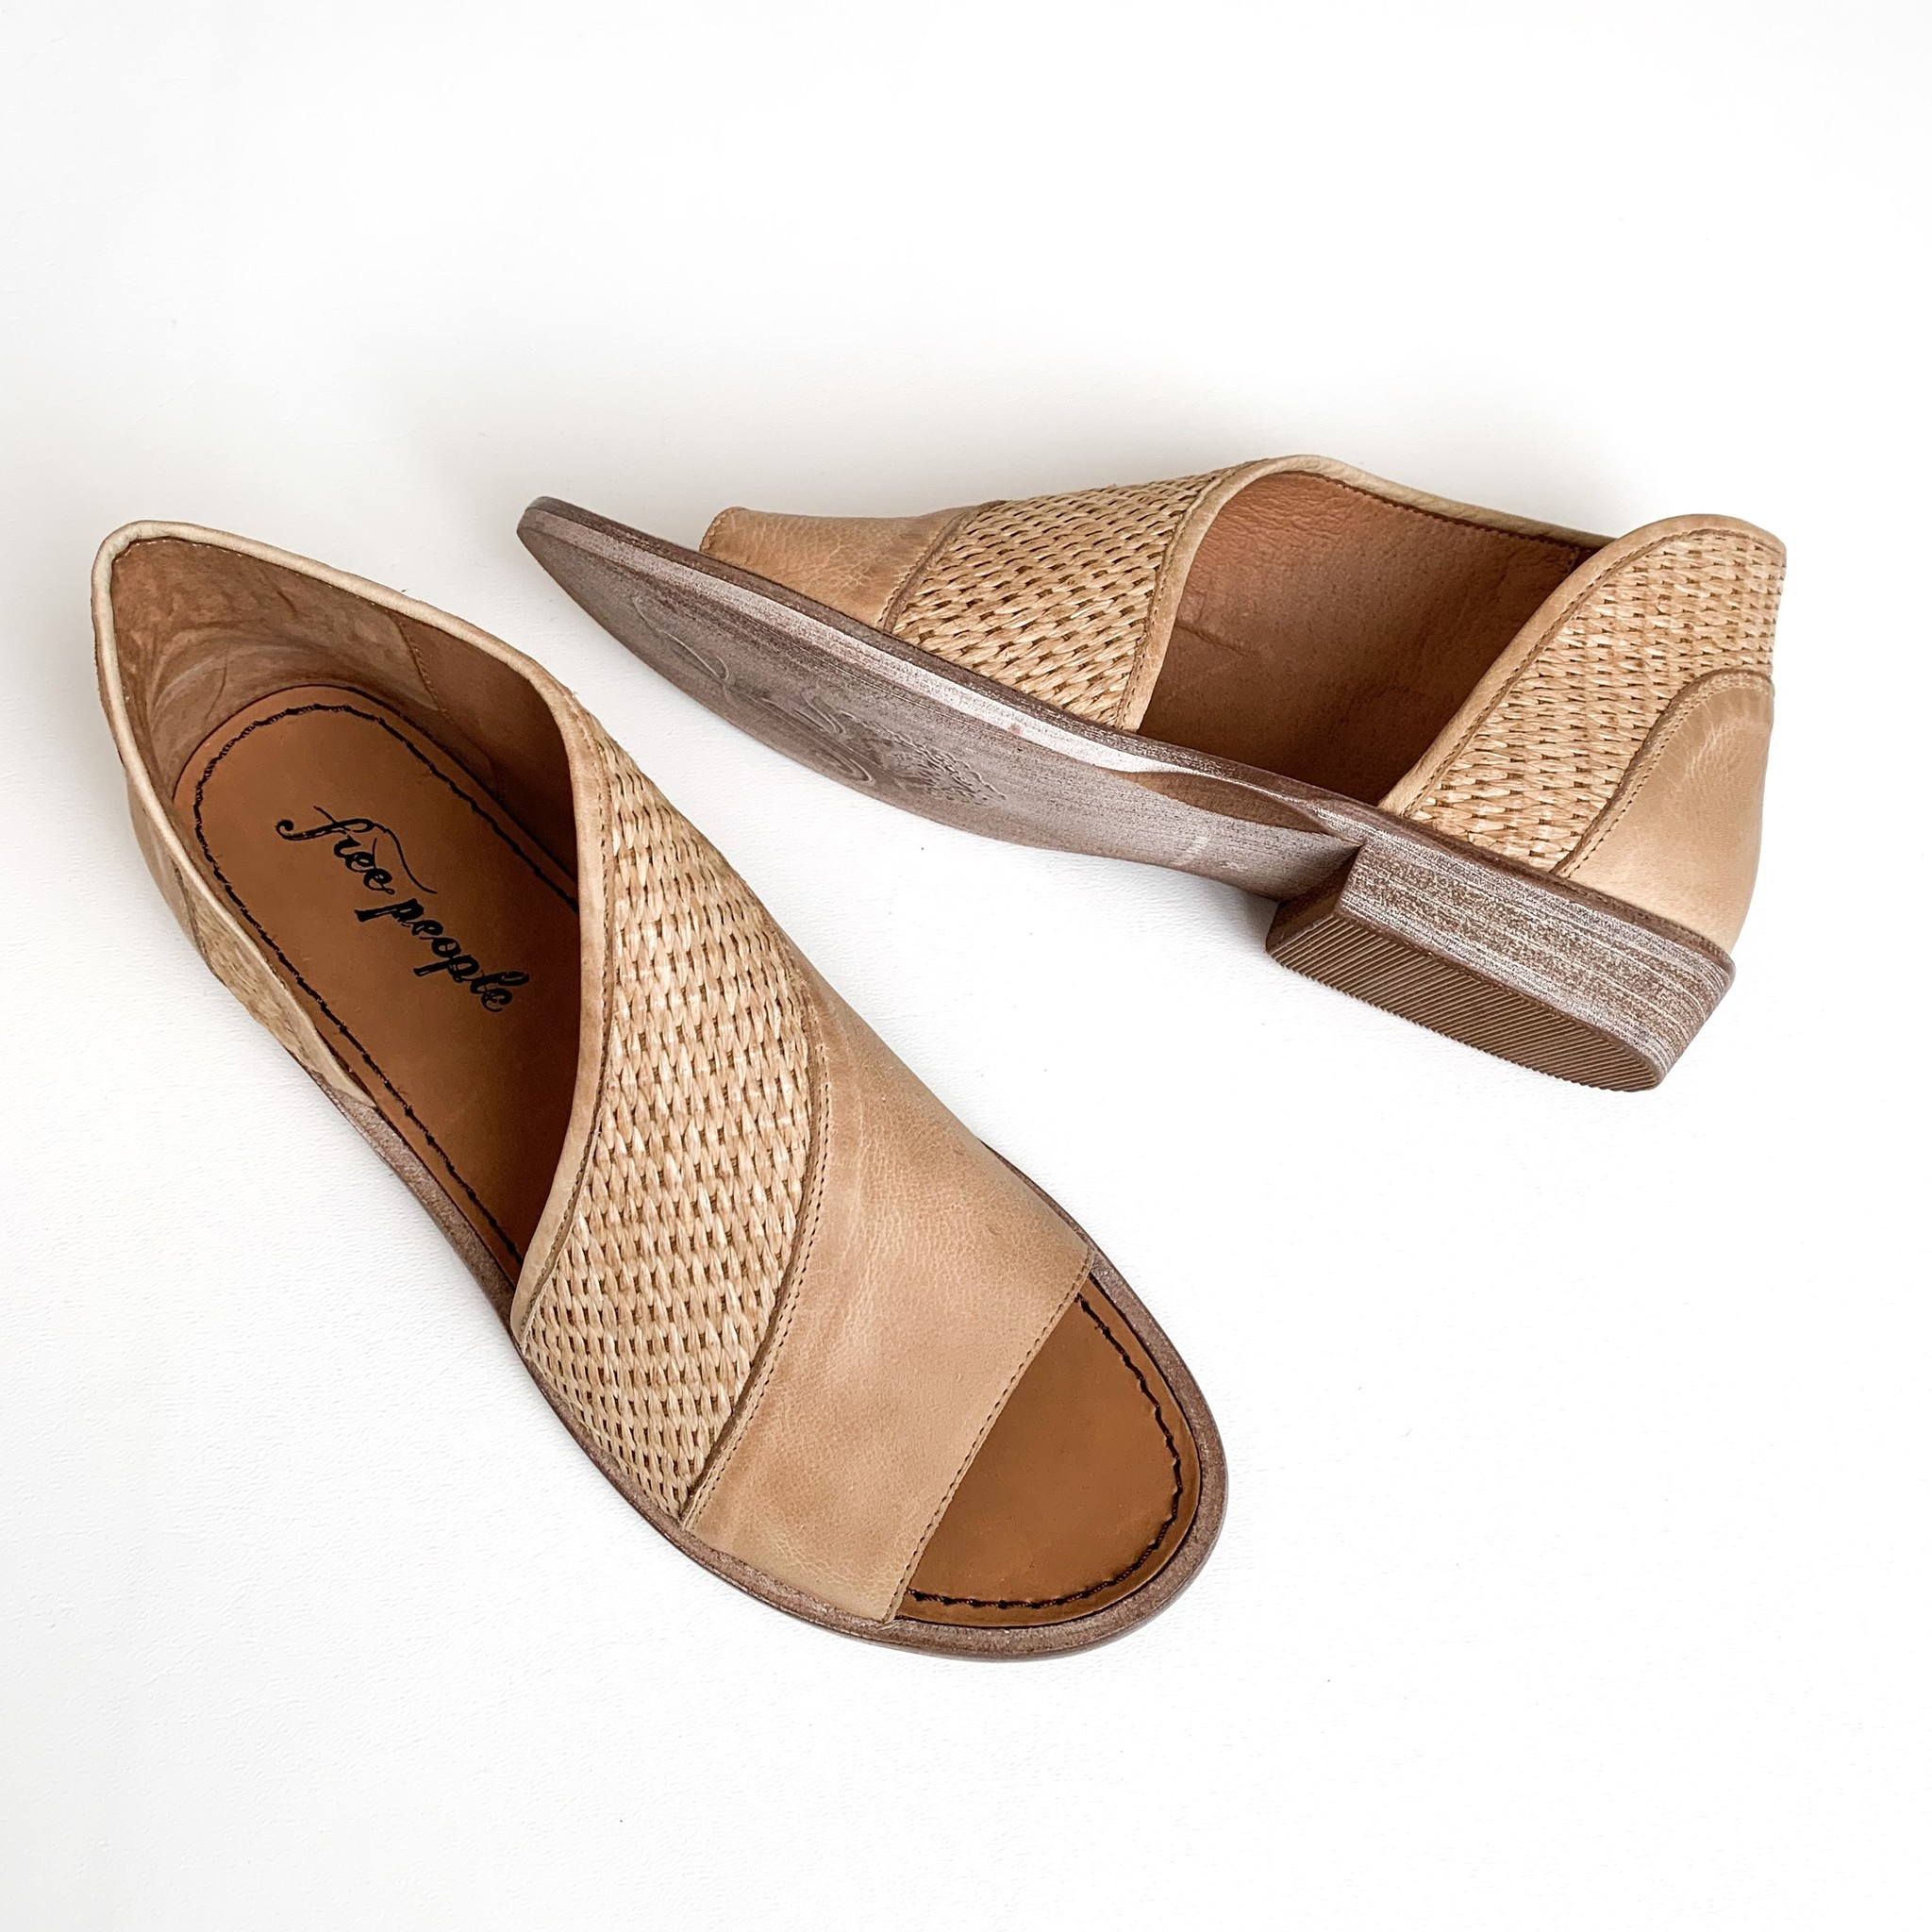 Free People textured mont blanc sandal